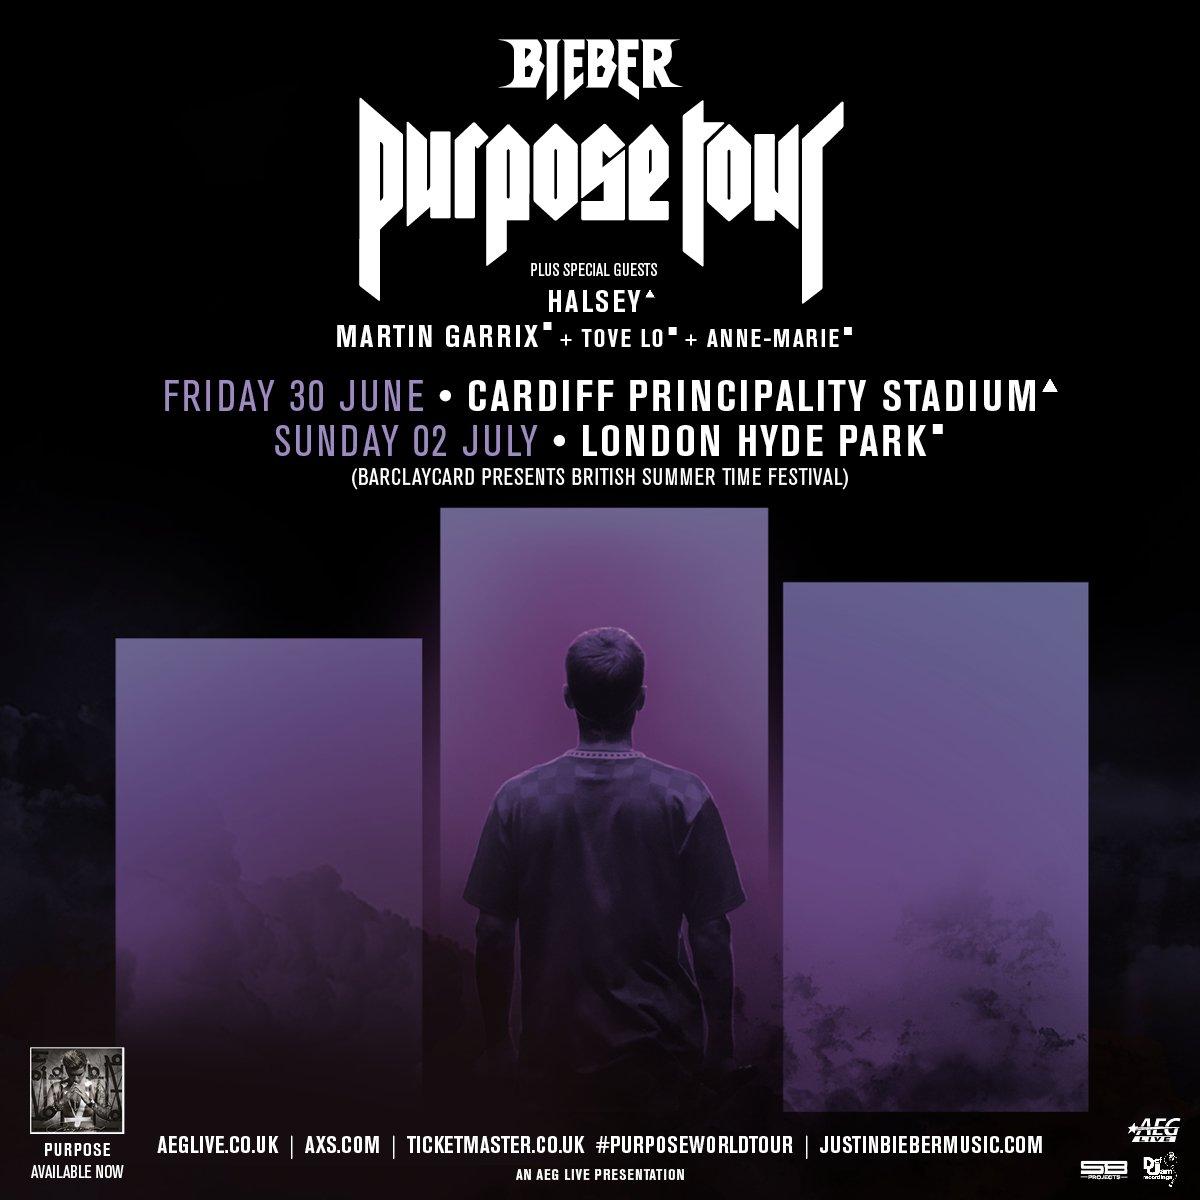 UK. Bringing #PurposeTour next summer to Cardiff and London